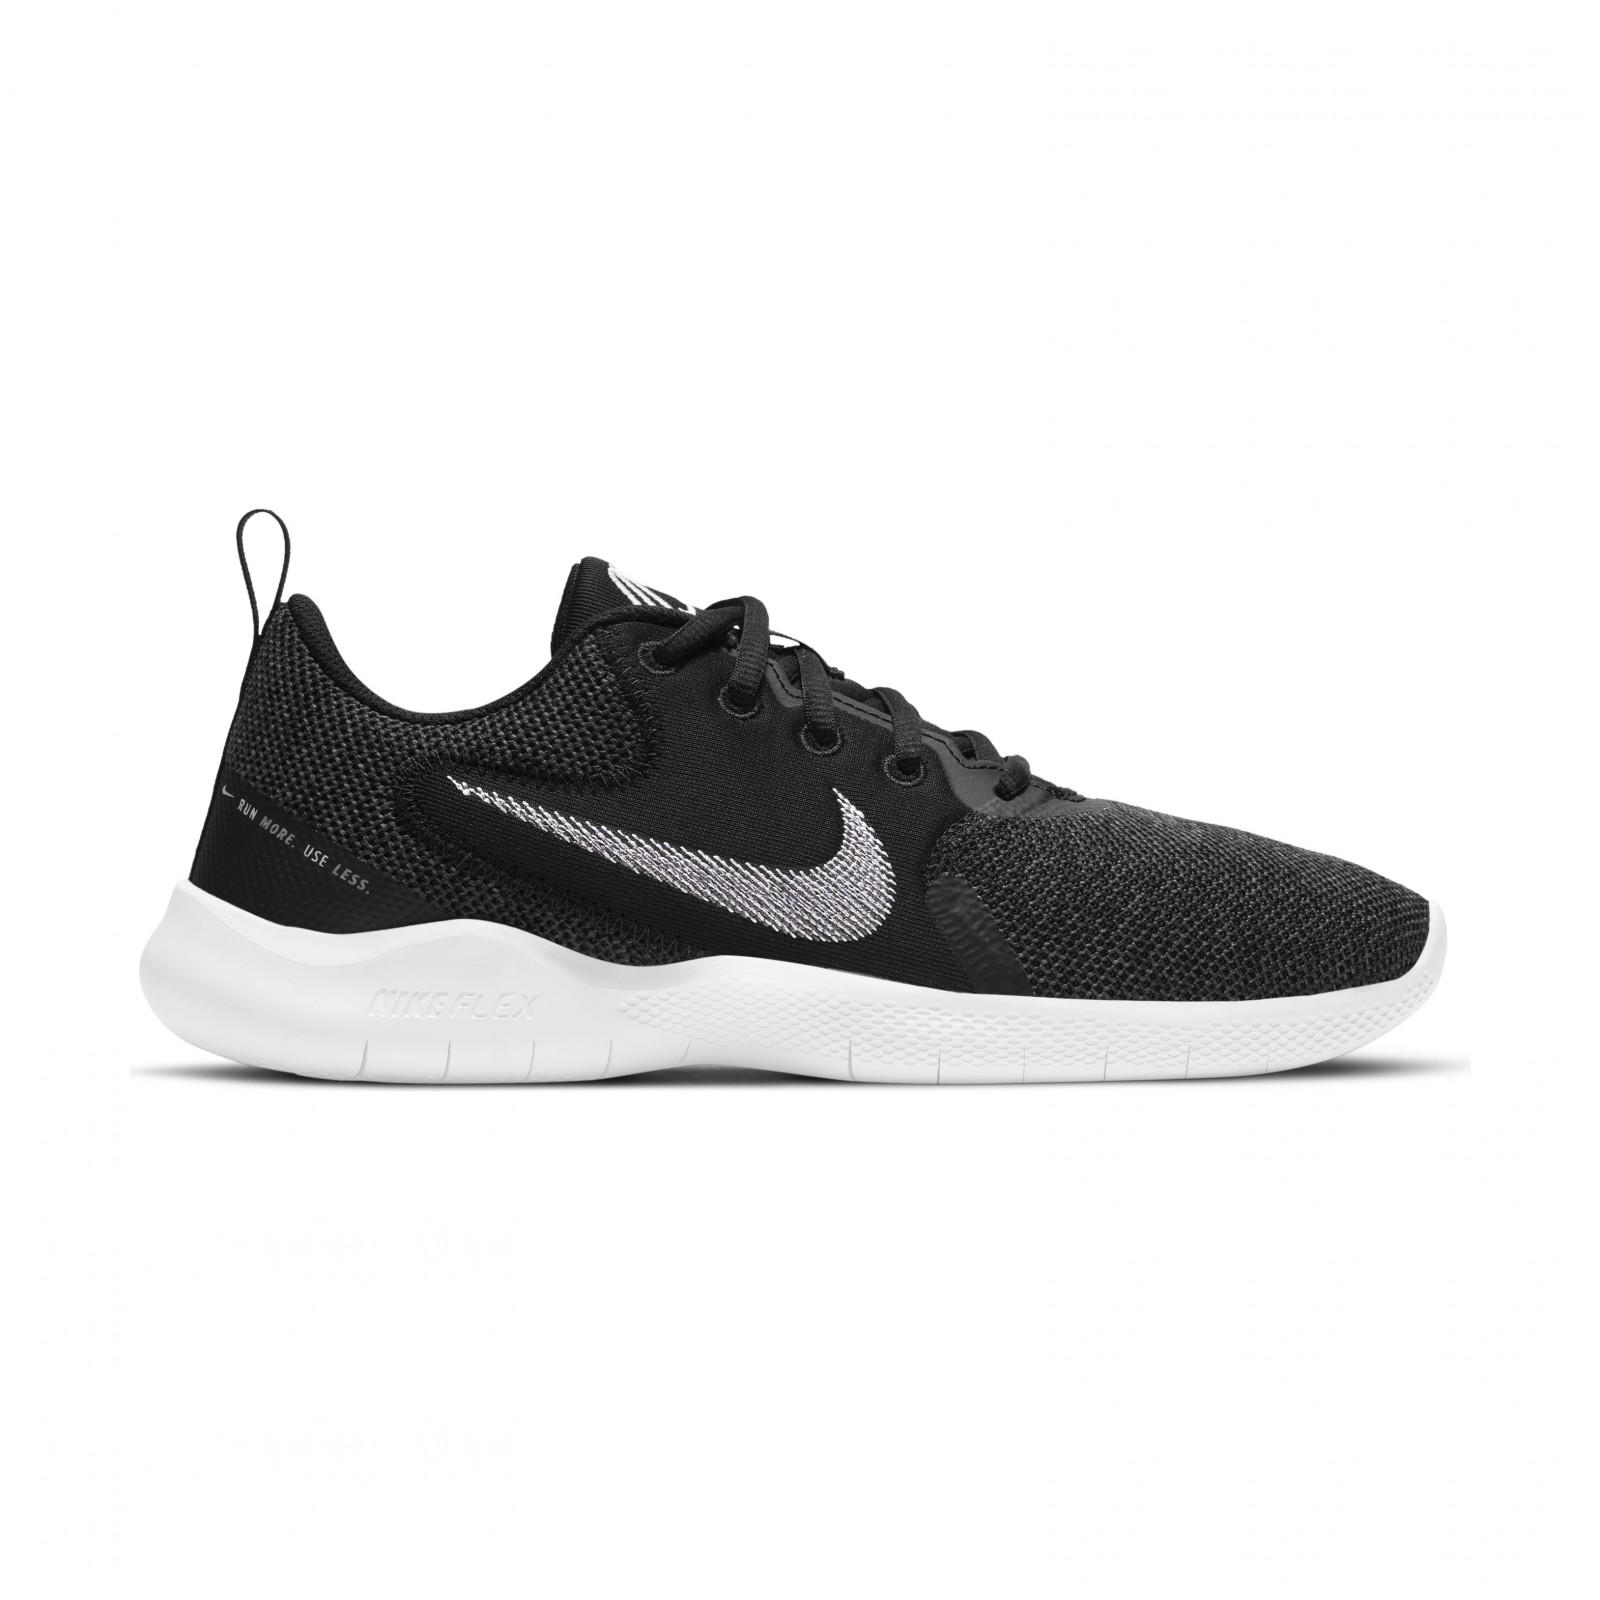 Nike Flex Experience Run 10 BLACK/WHITE-DK SMOKE GREY-IRON GREY